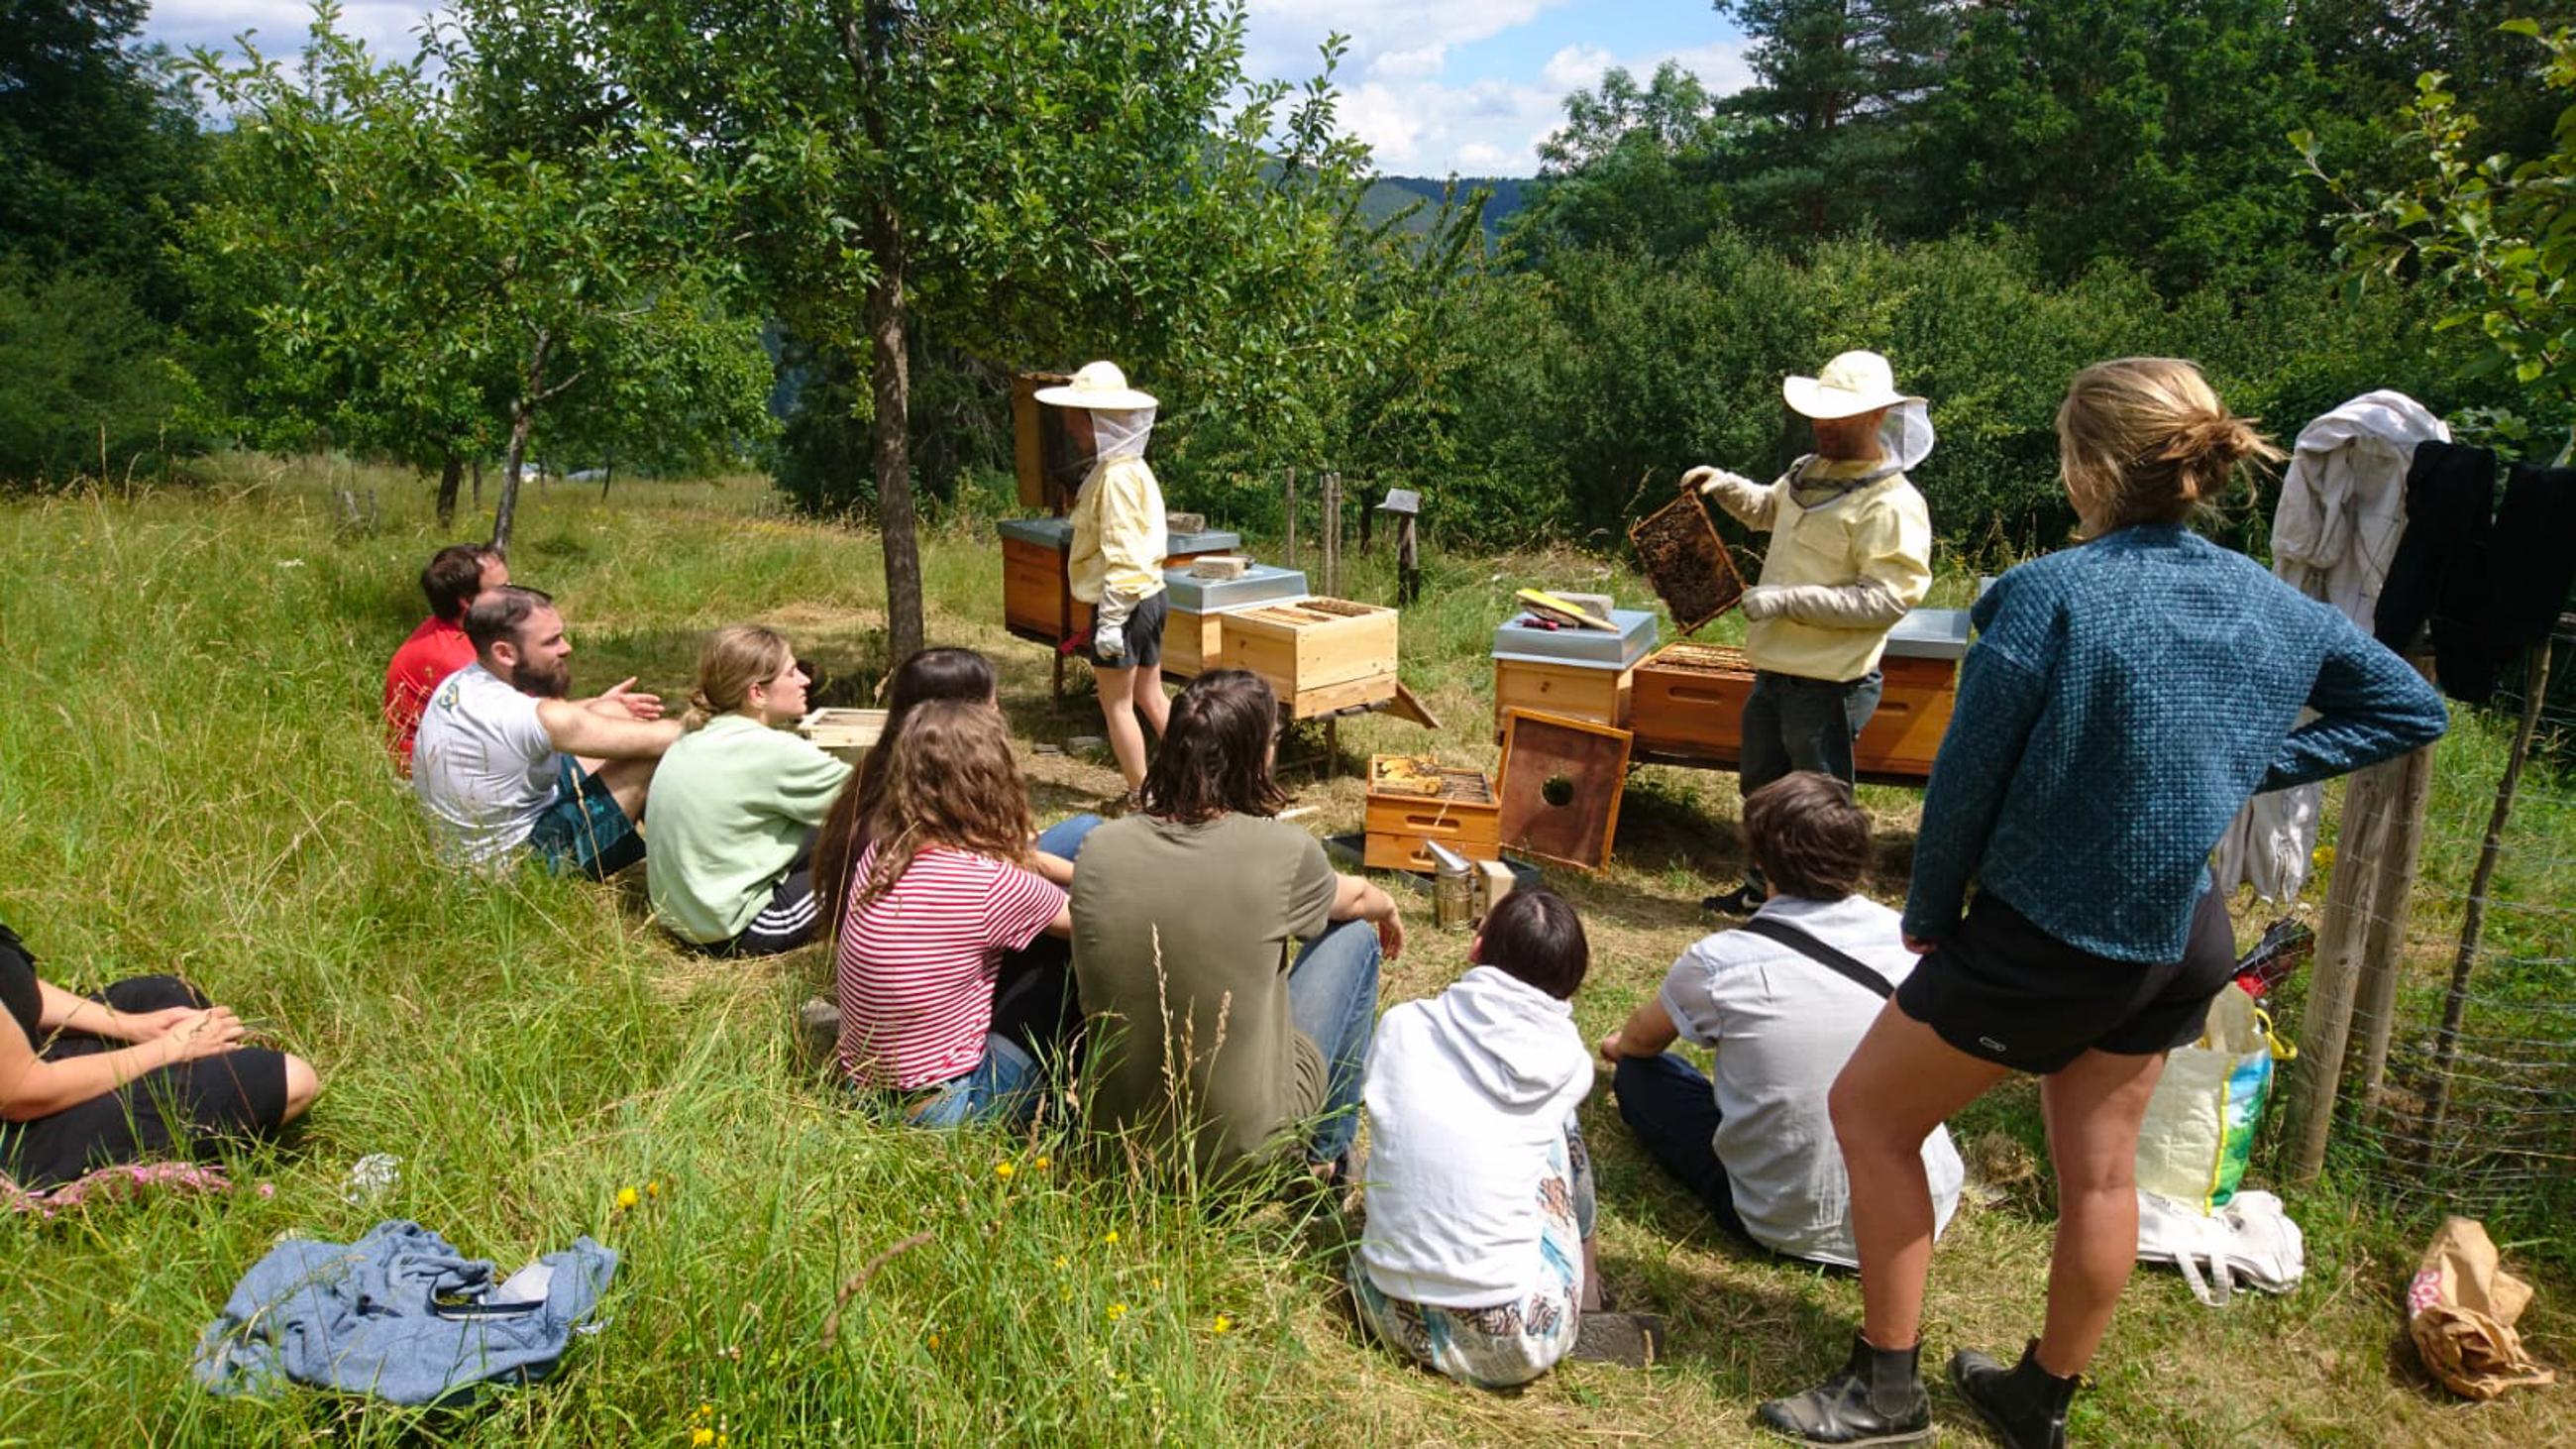 Bienenworkshop am Naturlehrpfad (Quelle: RAG Saalfeld-Rudolstadt)